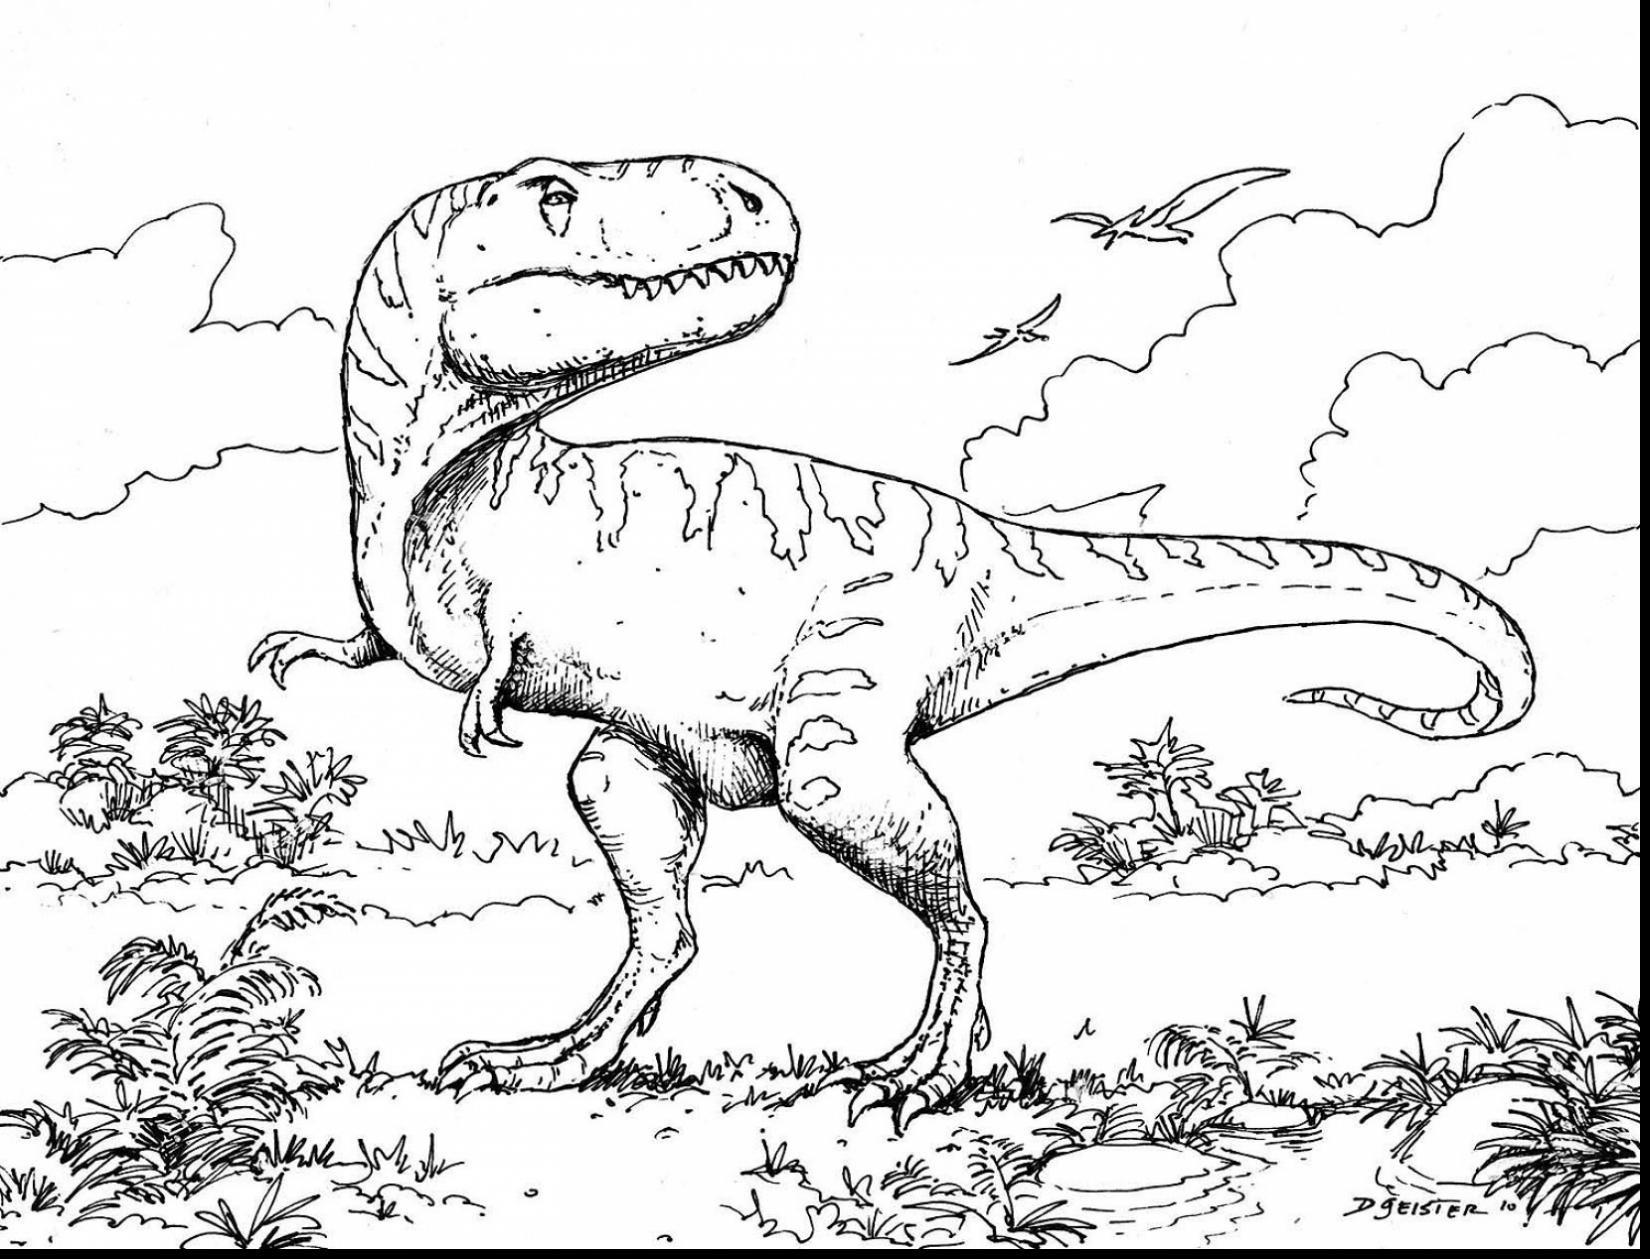 Coloring ~ Coloring Free Printable Dinosaur Cards For Kids - Free Printable Dinosaur Coloring Pages